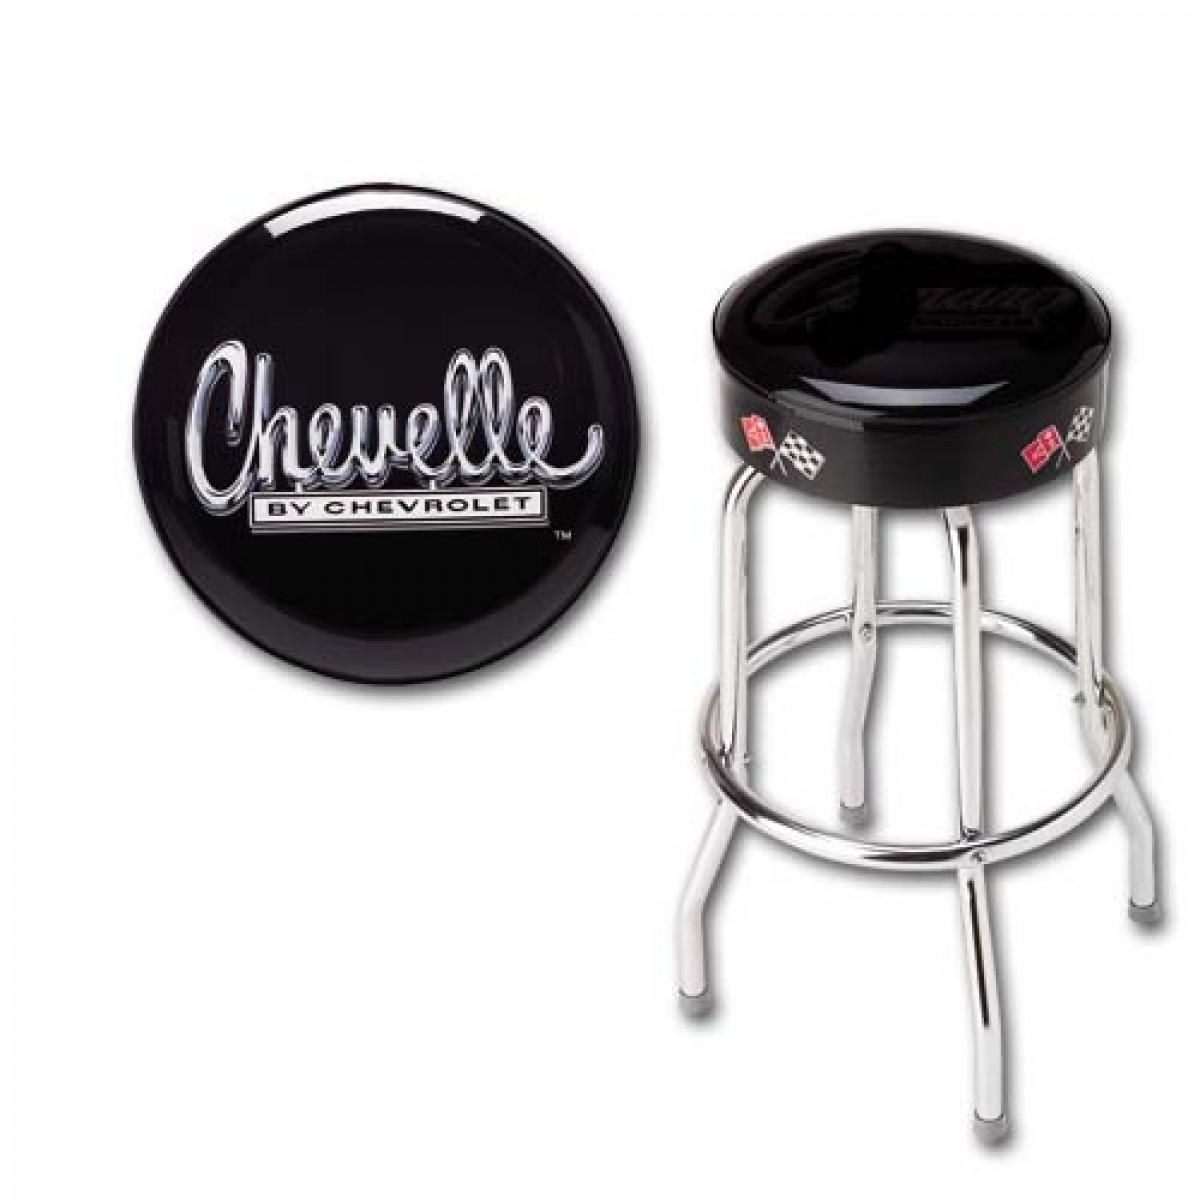 HossRodscom Chevelle Counter Stool Hot Rod  : rw ss841 from www.hossrods.com size 1200 x 1200 jpeg 116kB